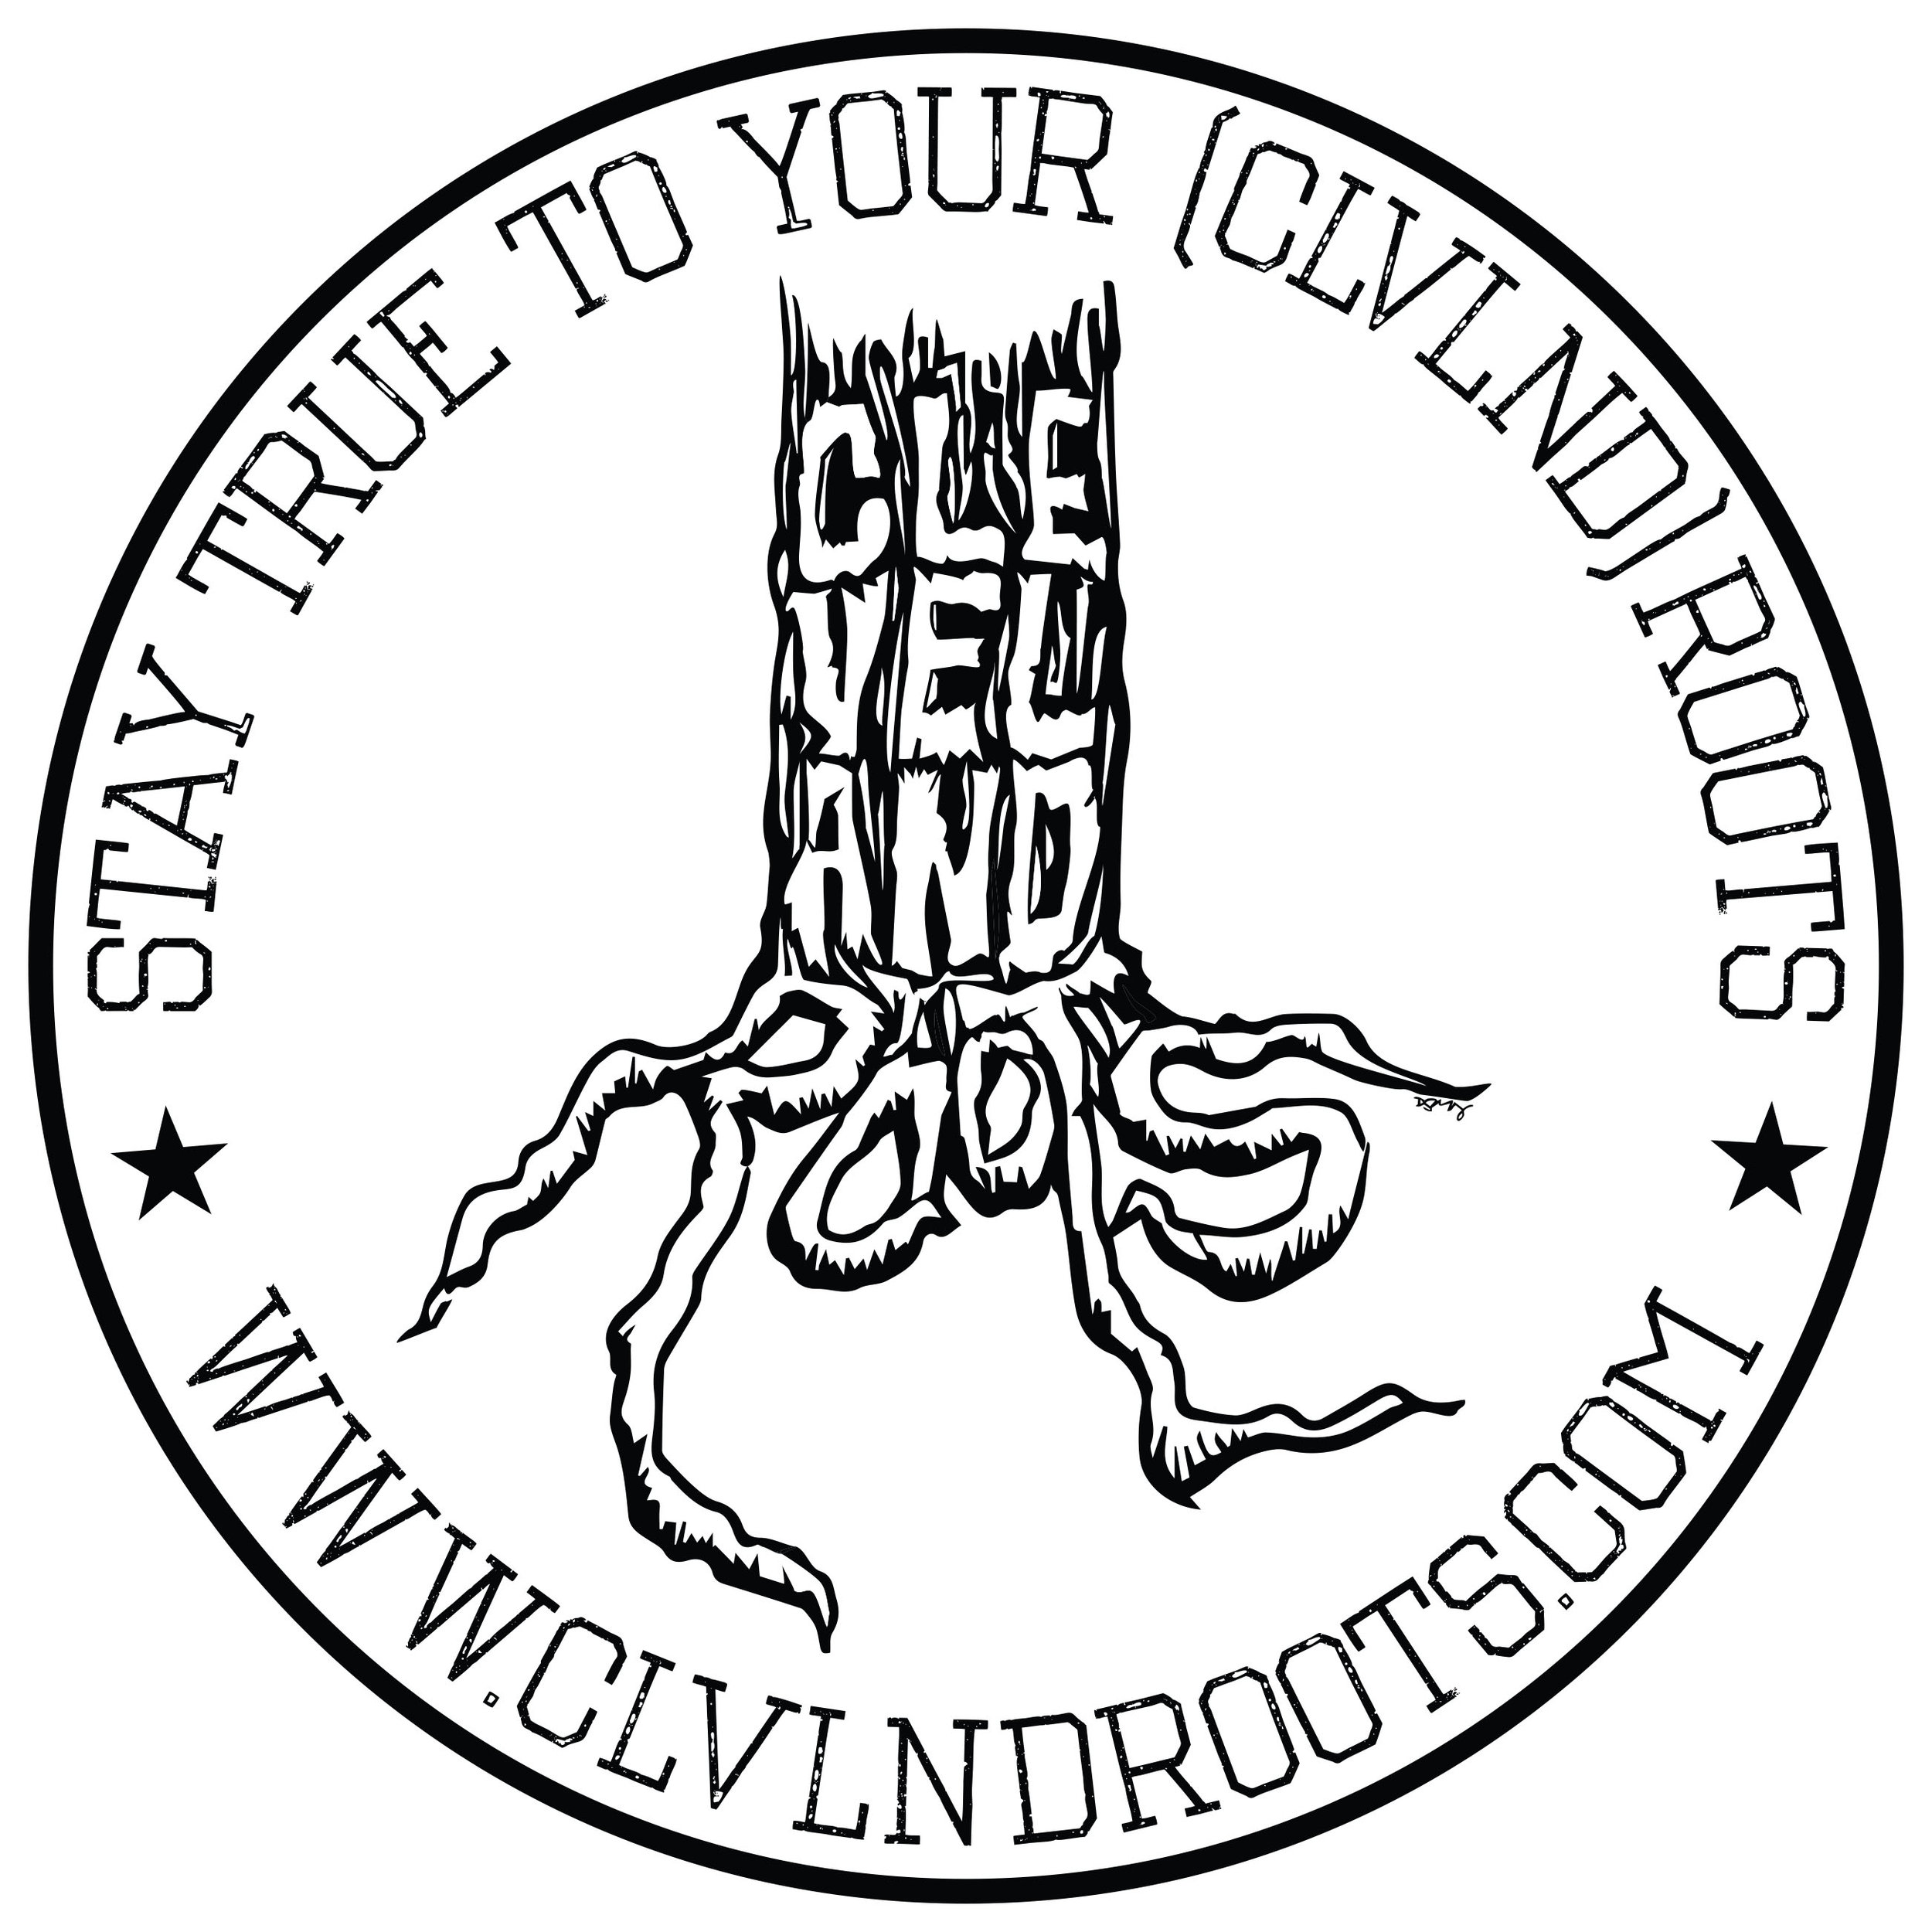 CLVLNDROOTS promo logo.jpg